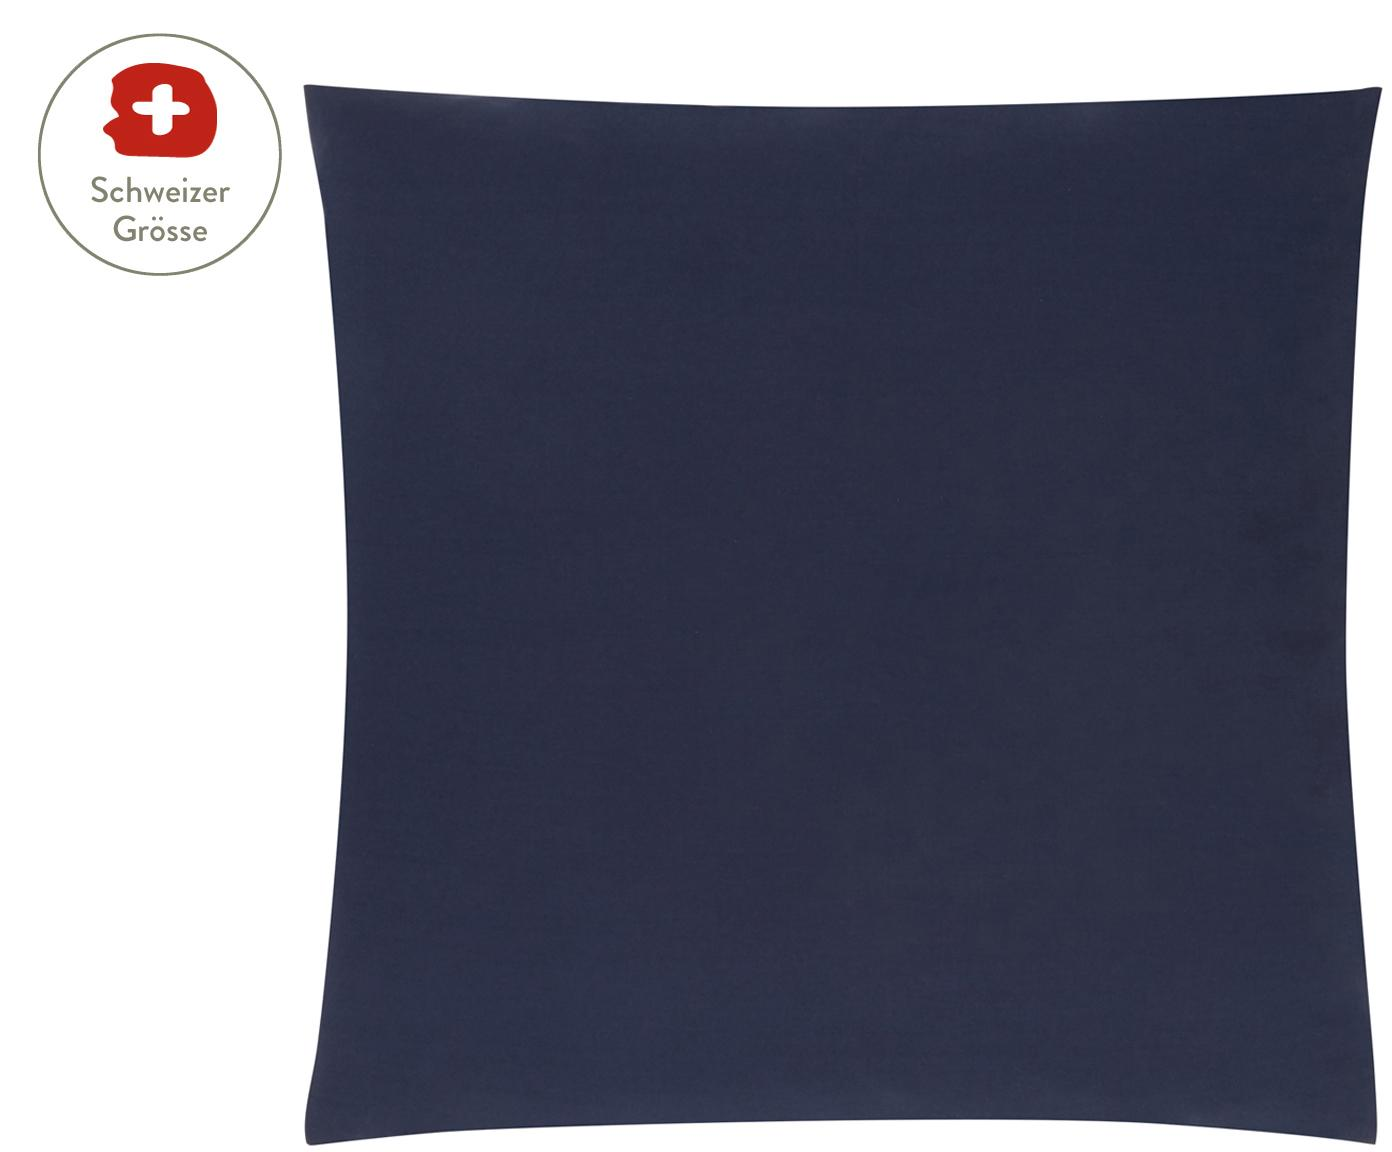 Baumwollperkal-Kissenbezug Elsie in Dunkelblau, Webart: Perkal Fadendichte 200 TC, Dunkelblau, 65 x 65 cm